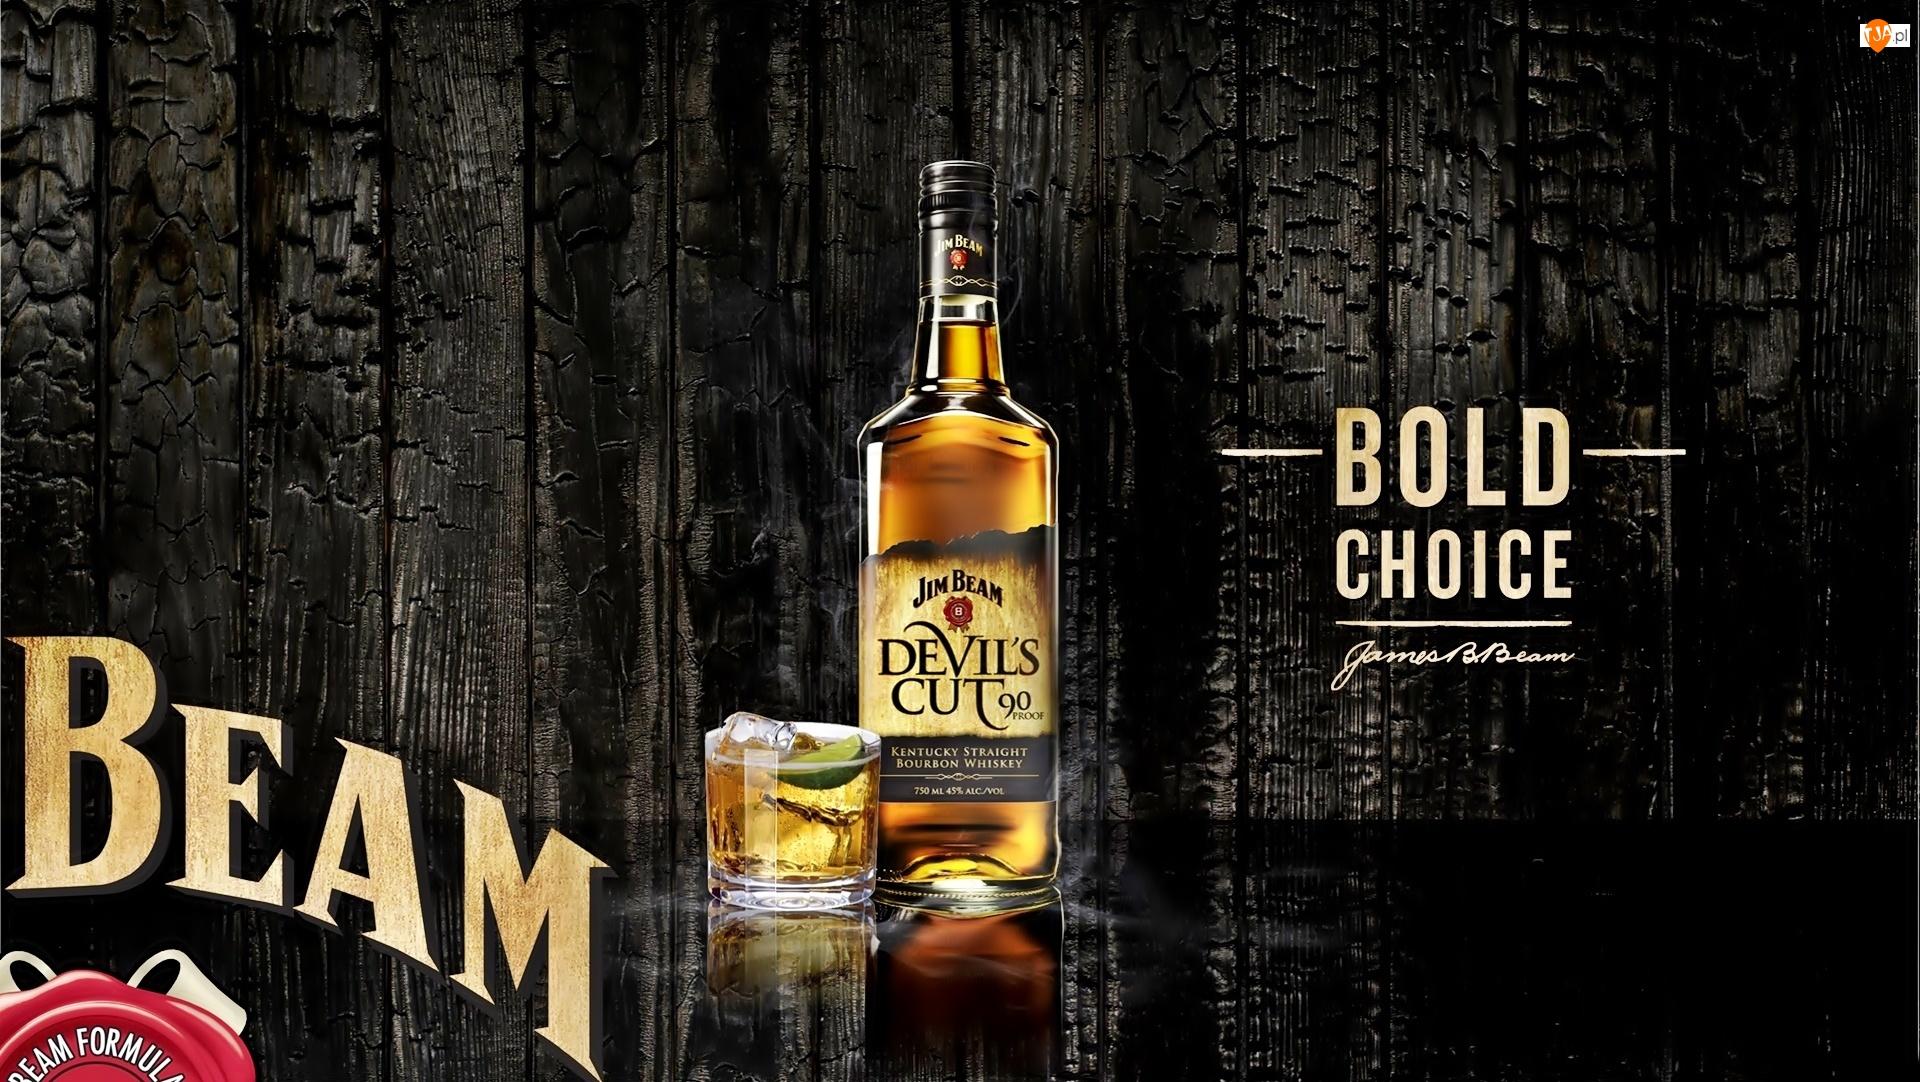 Szklanka, Whisky, Butelka